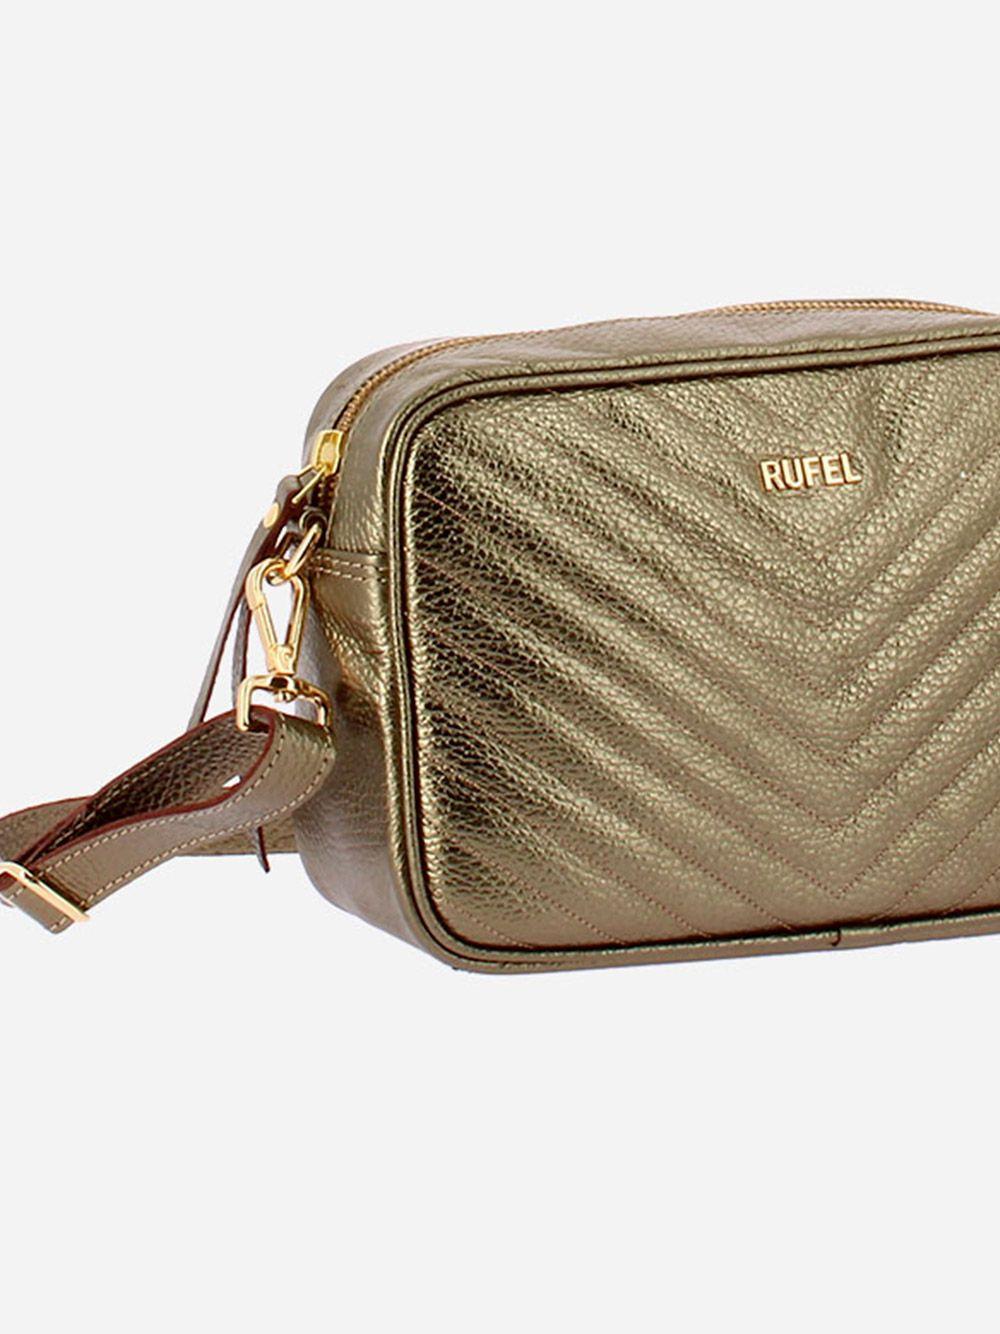 Nature CH Bronze Crossbody Bag | Rufel